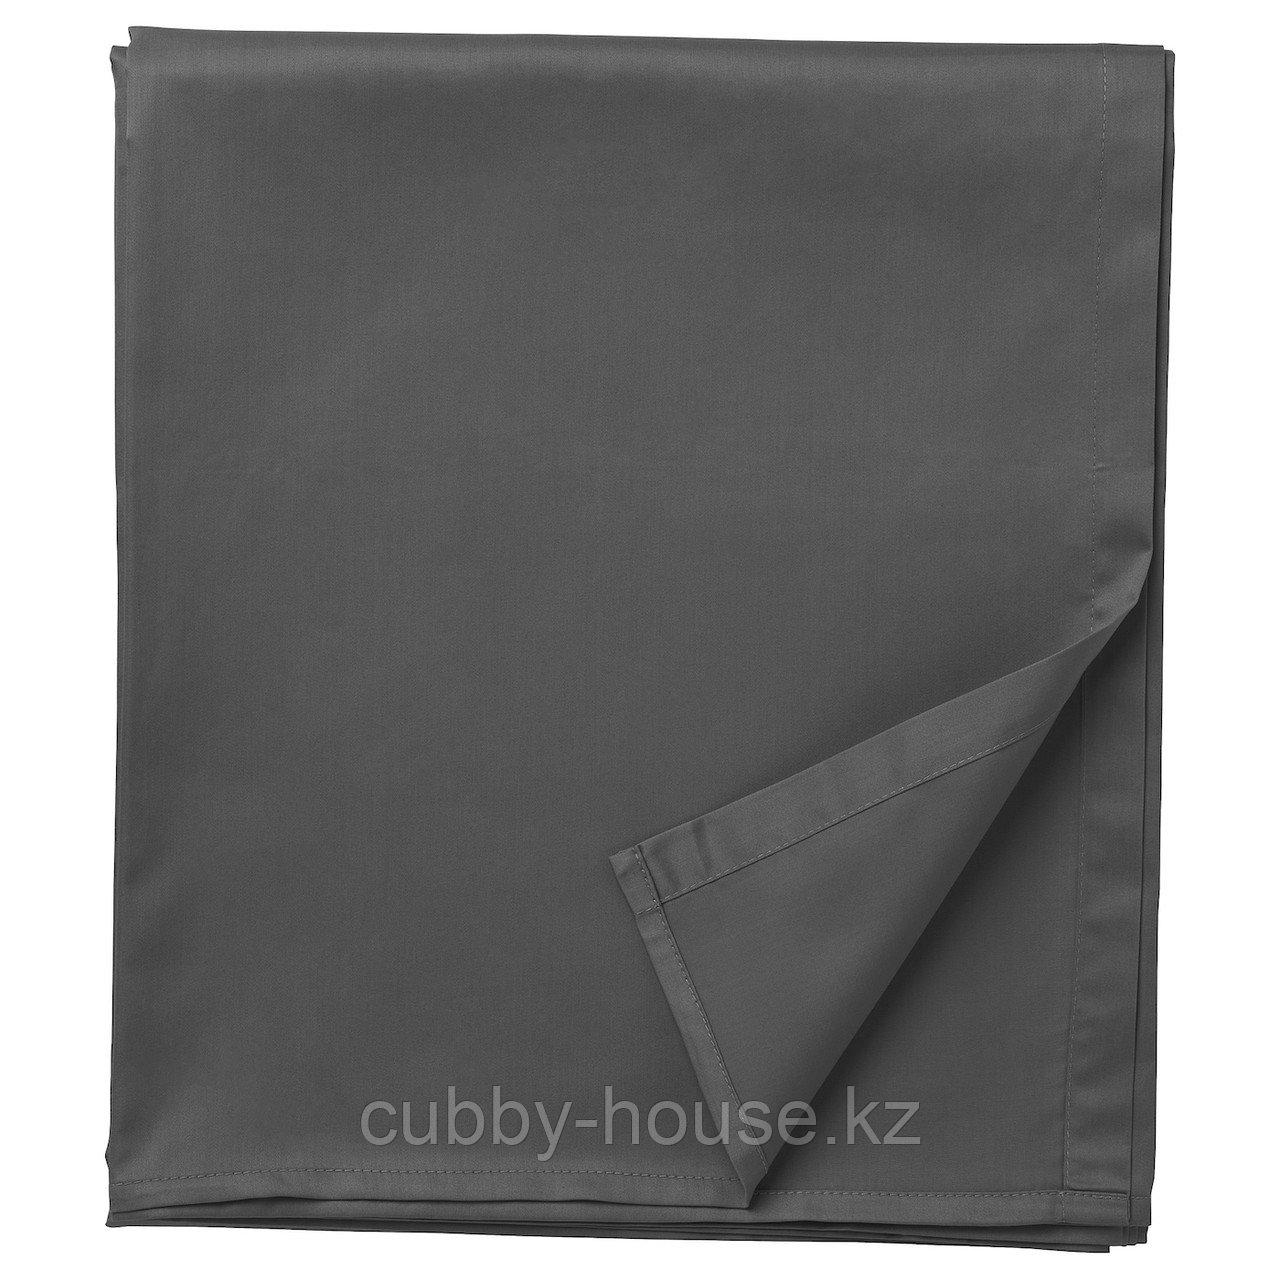 НАТТЭСМИН Простыня, темно-серый, 240x260 см